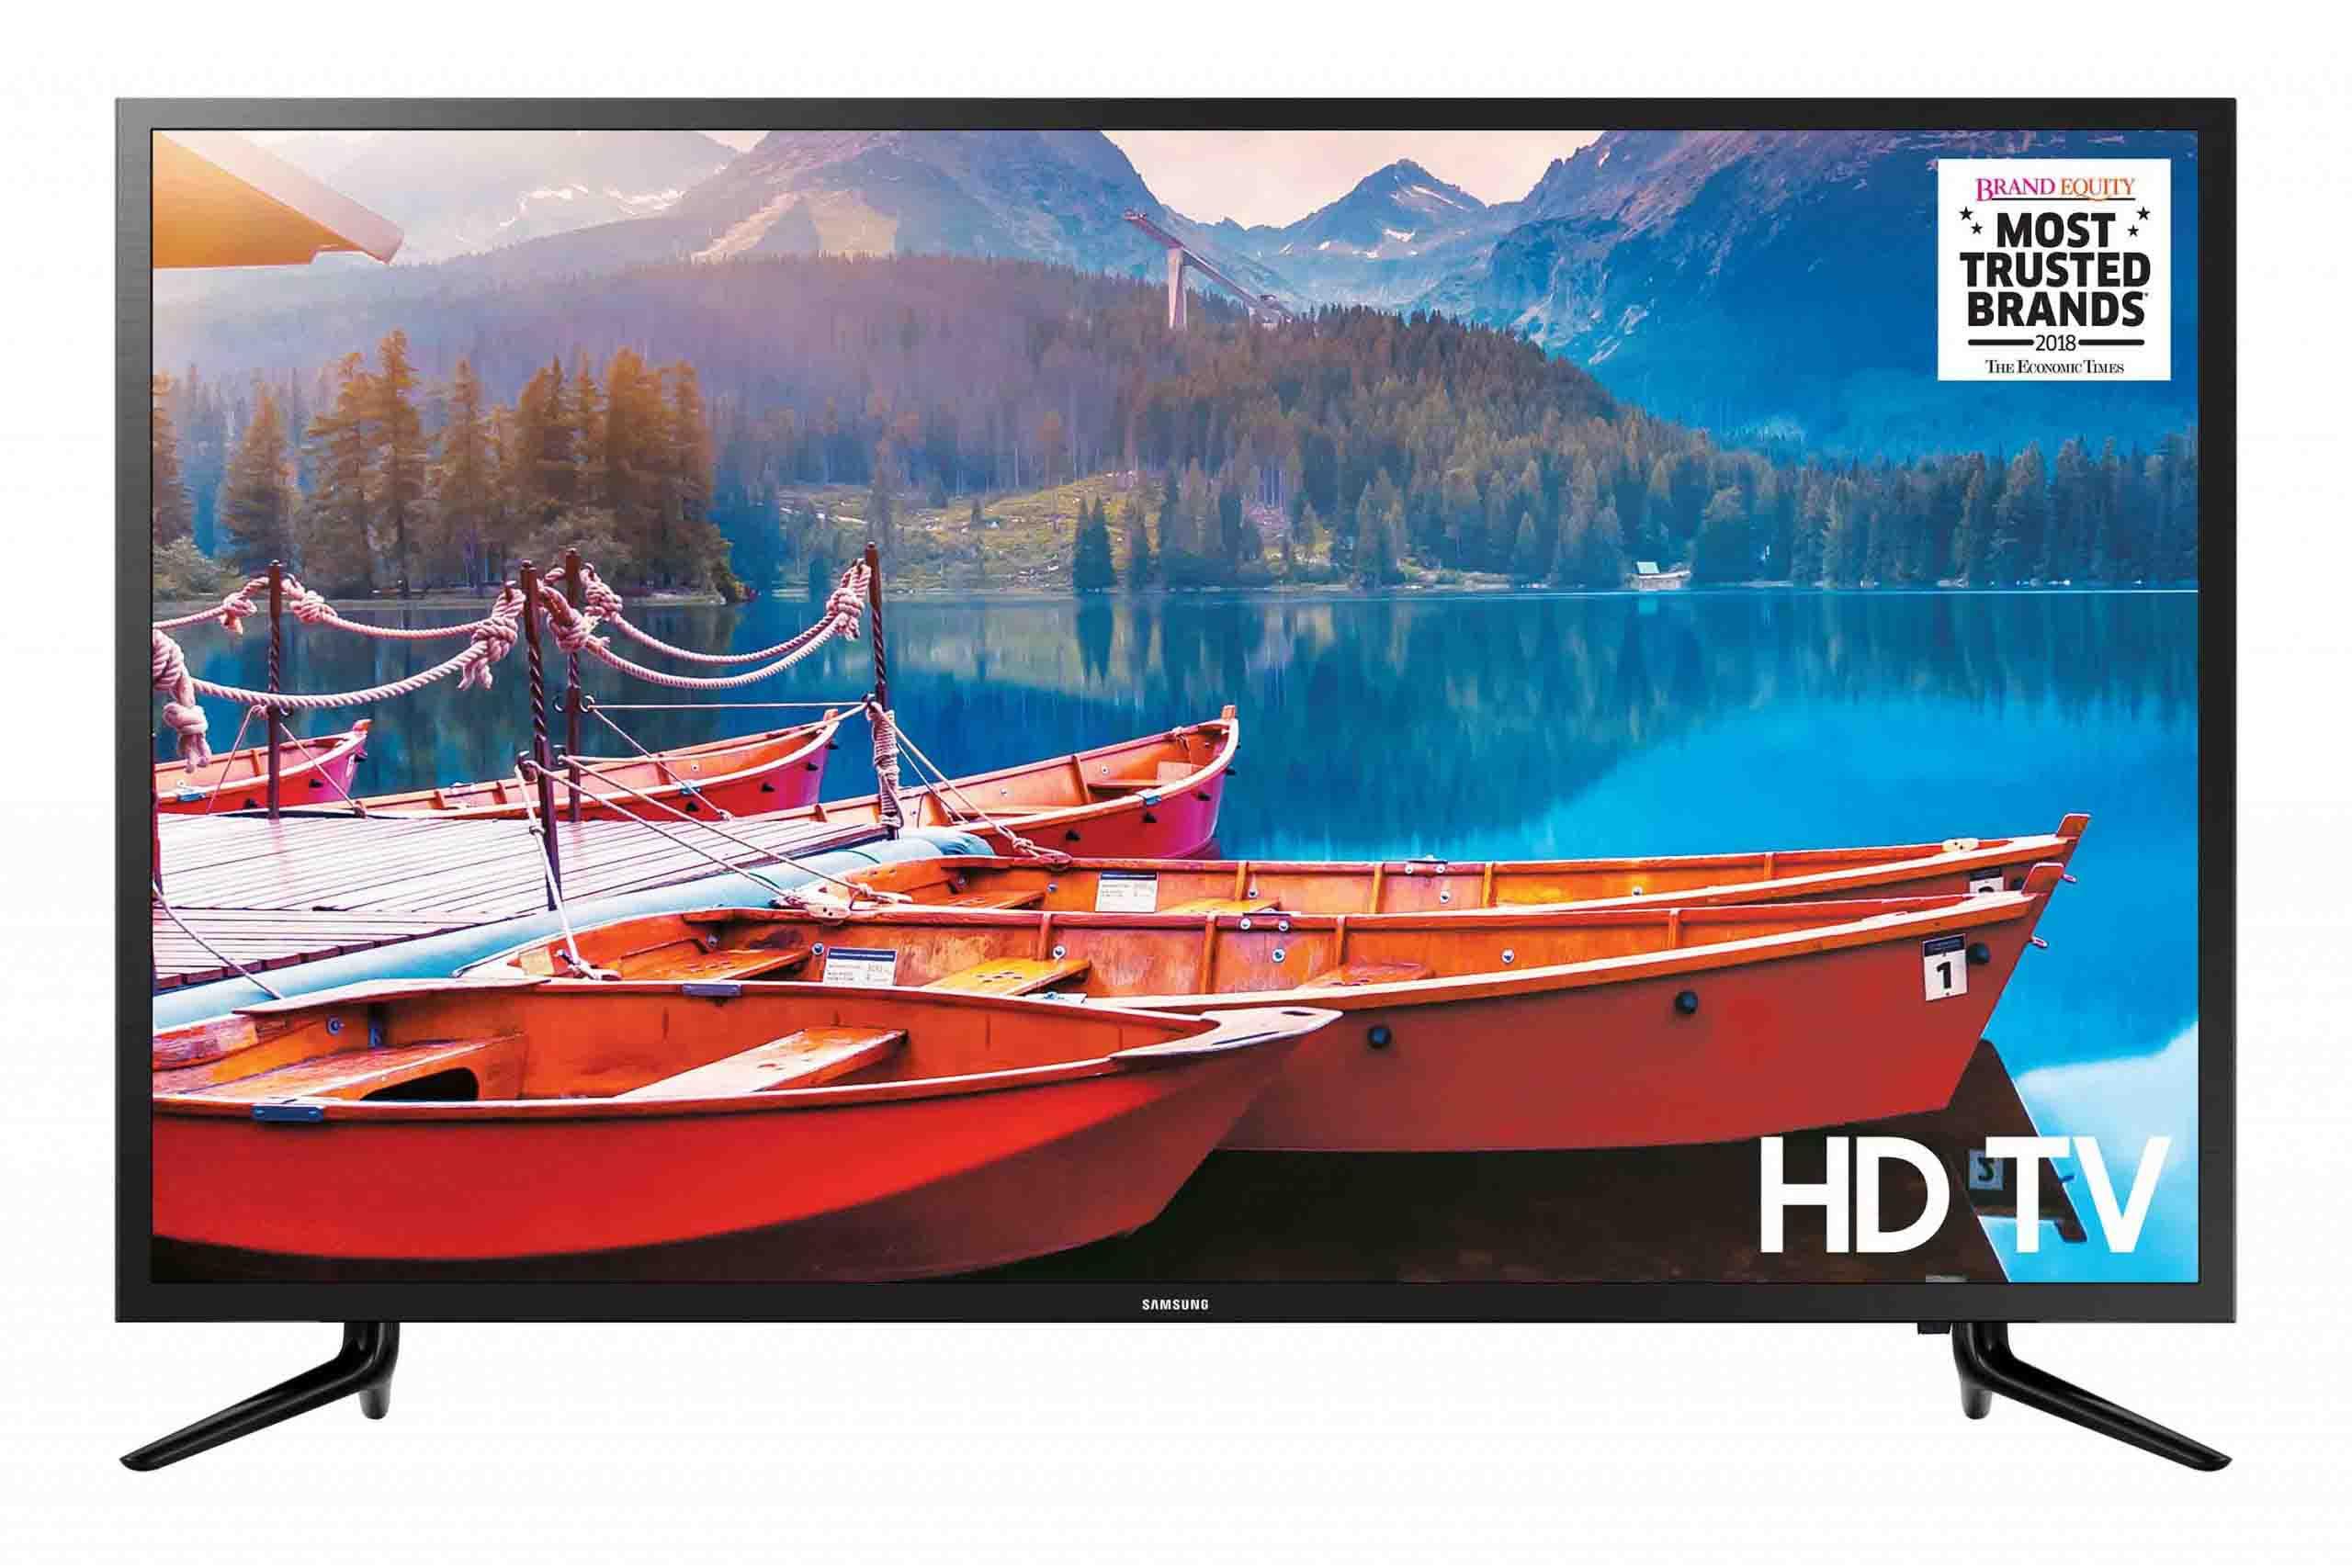 Samsung TV scaled 1 1